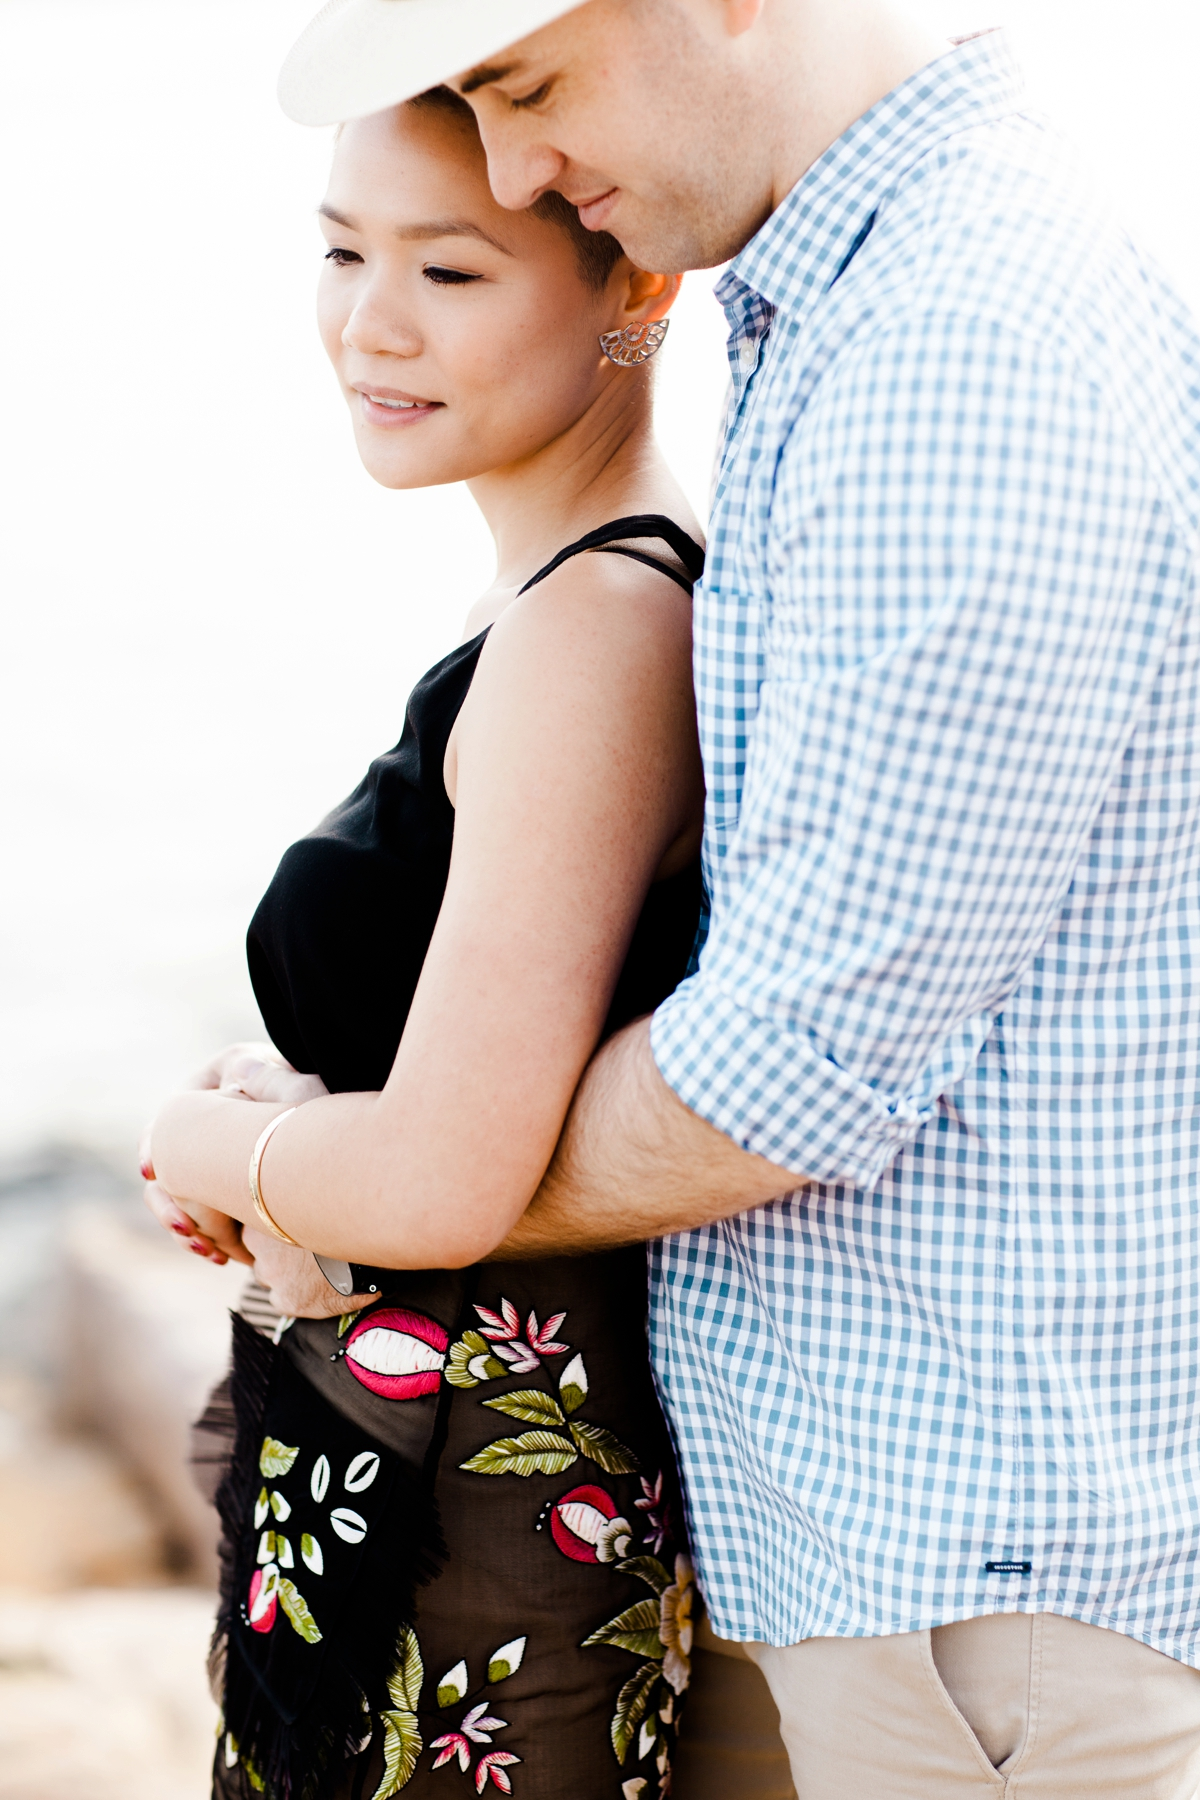 Couples session Pyrmont Photography by Mr Edwards Sydney_3484.jpg